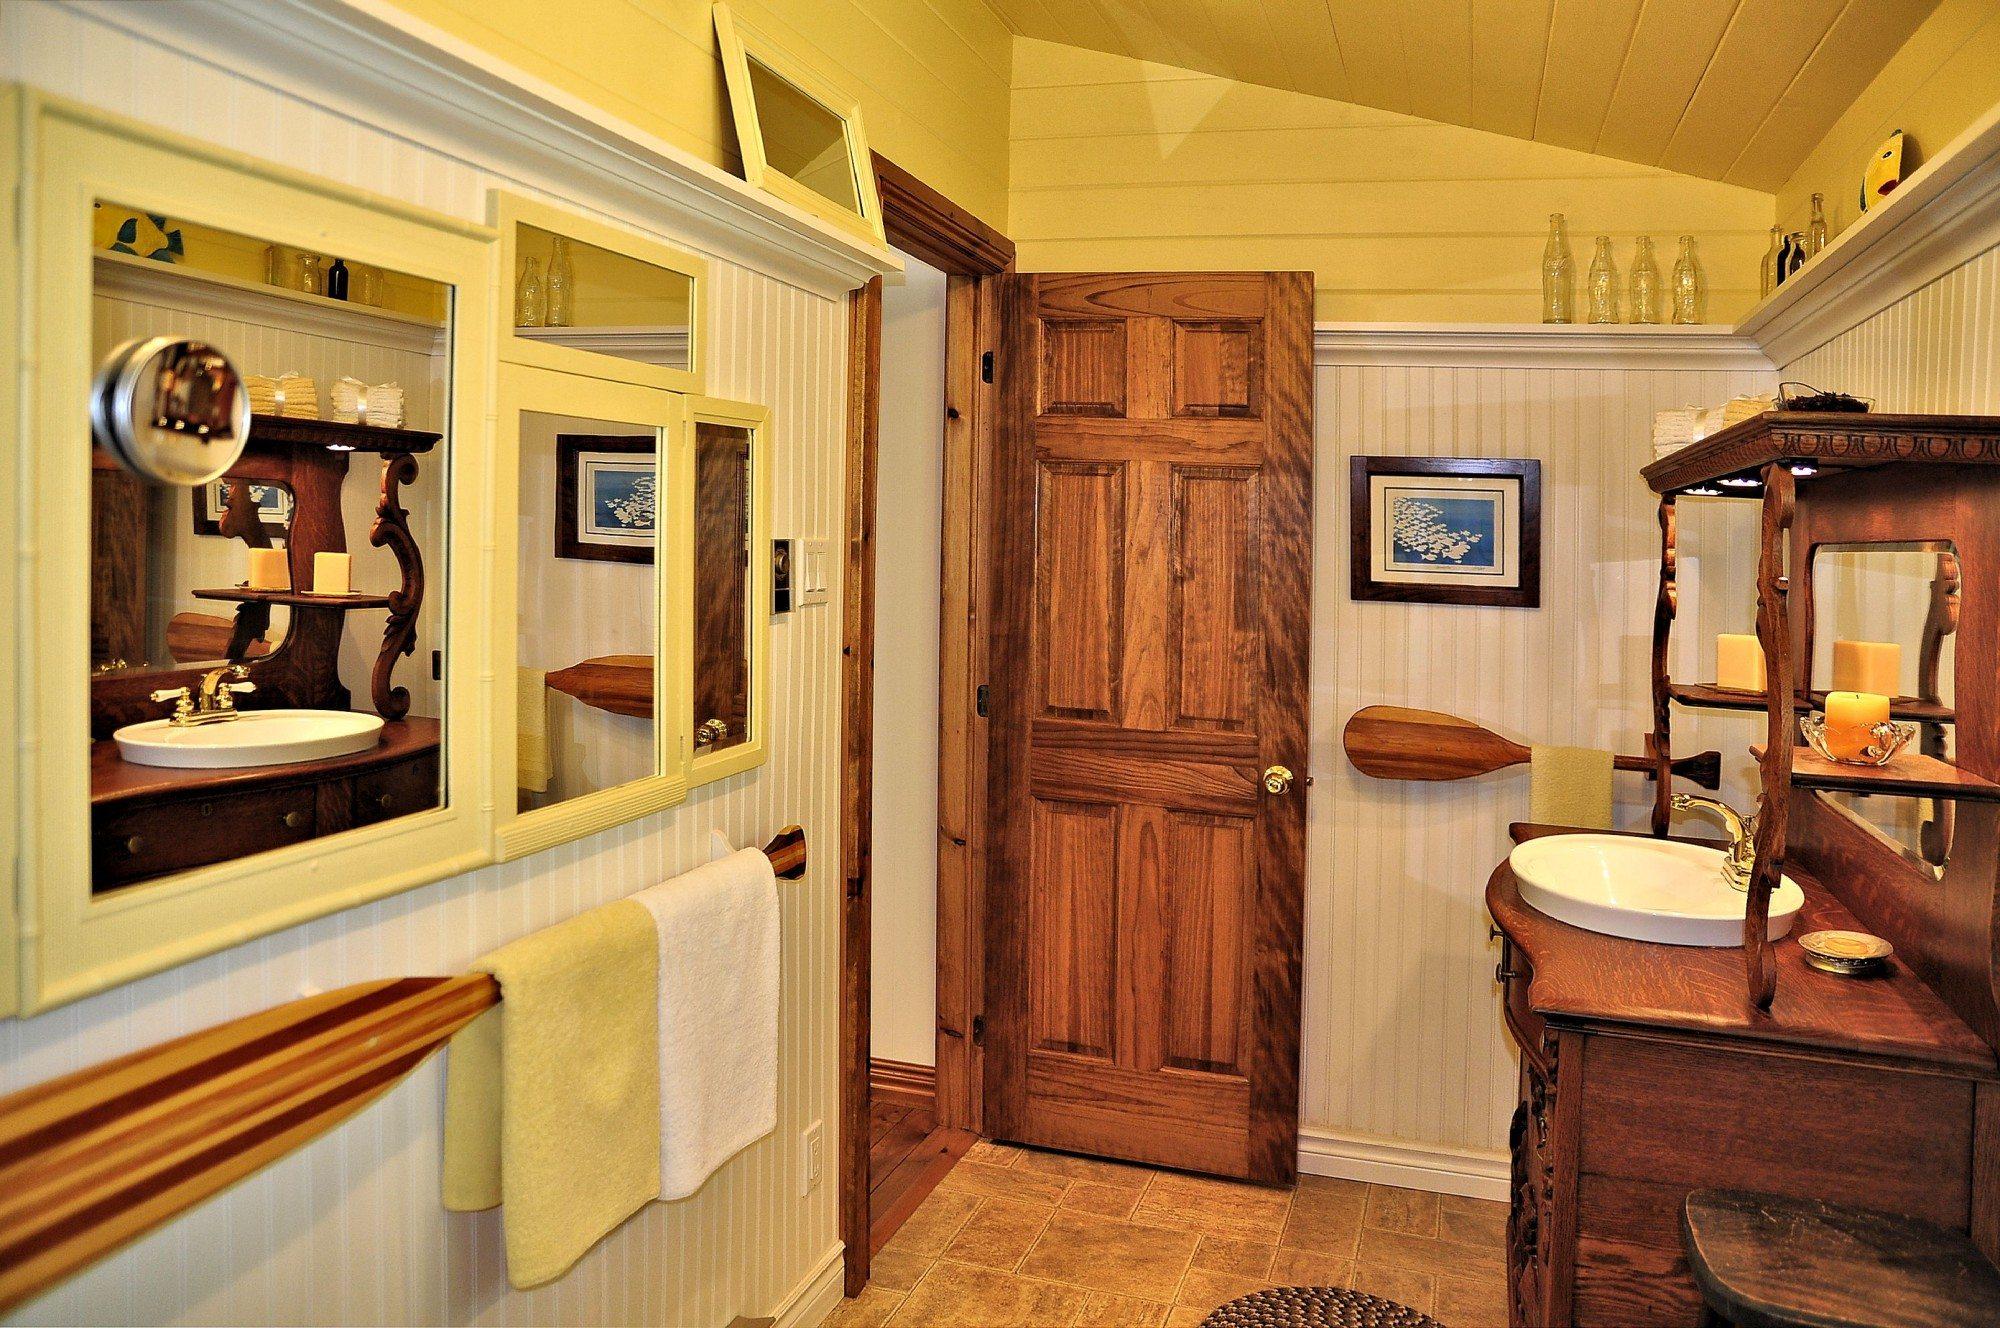 kawartha-lakes-cottage-for-sale-315-crego-lake-road-8